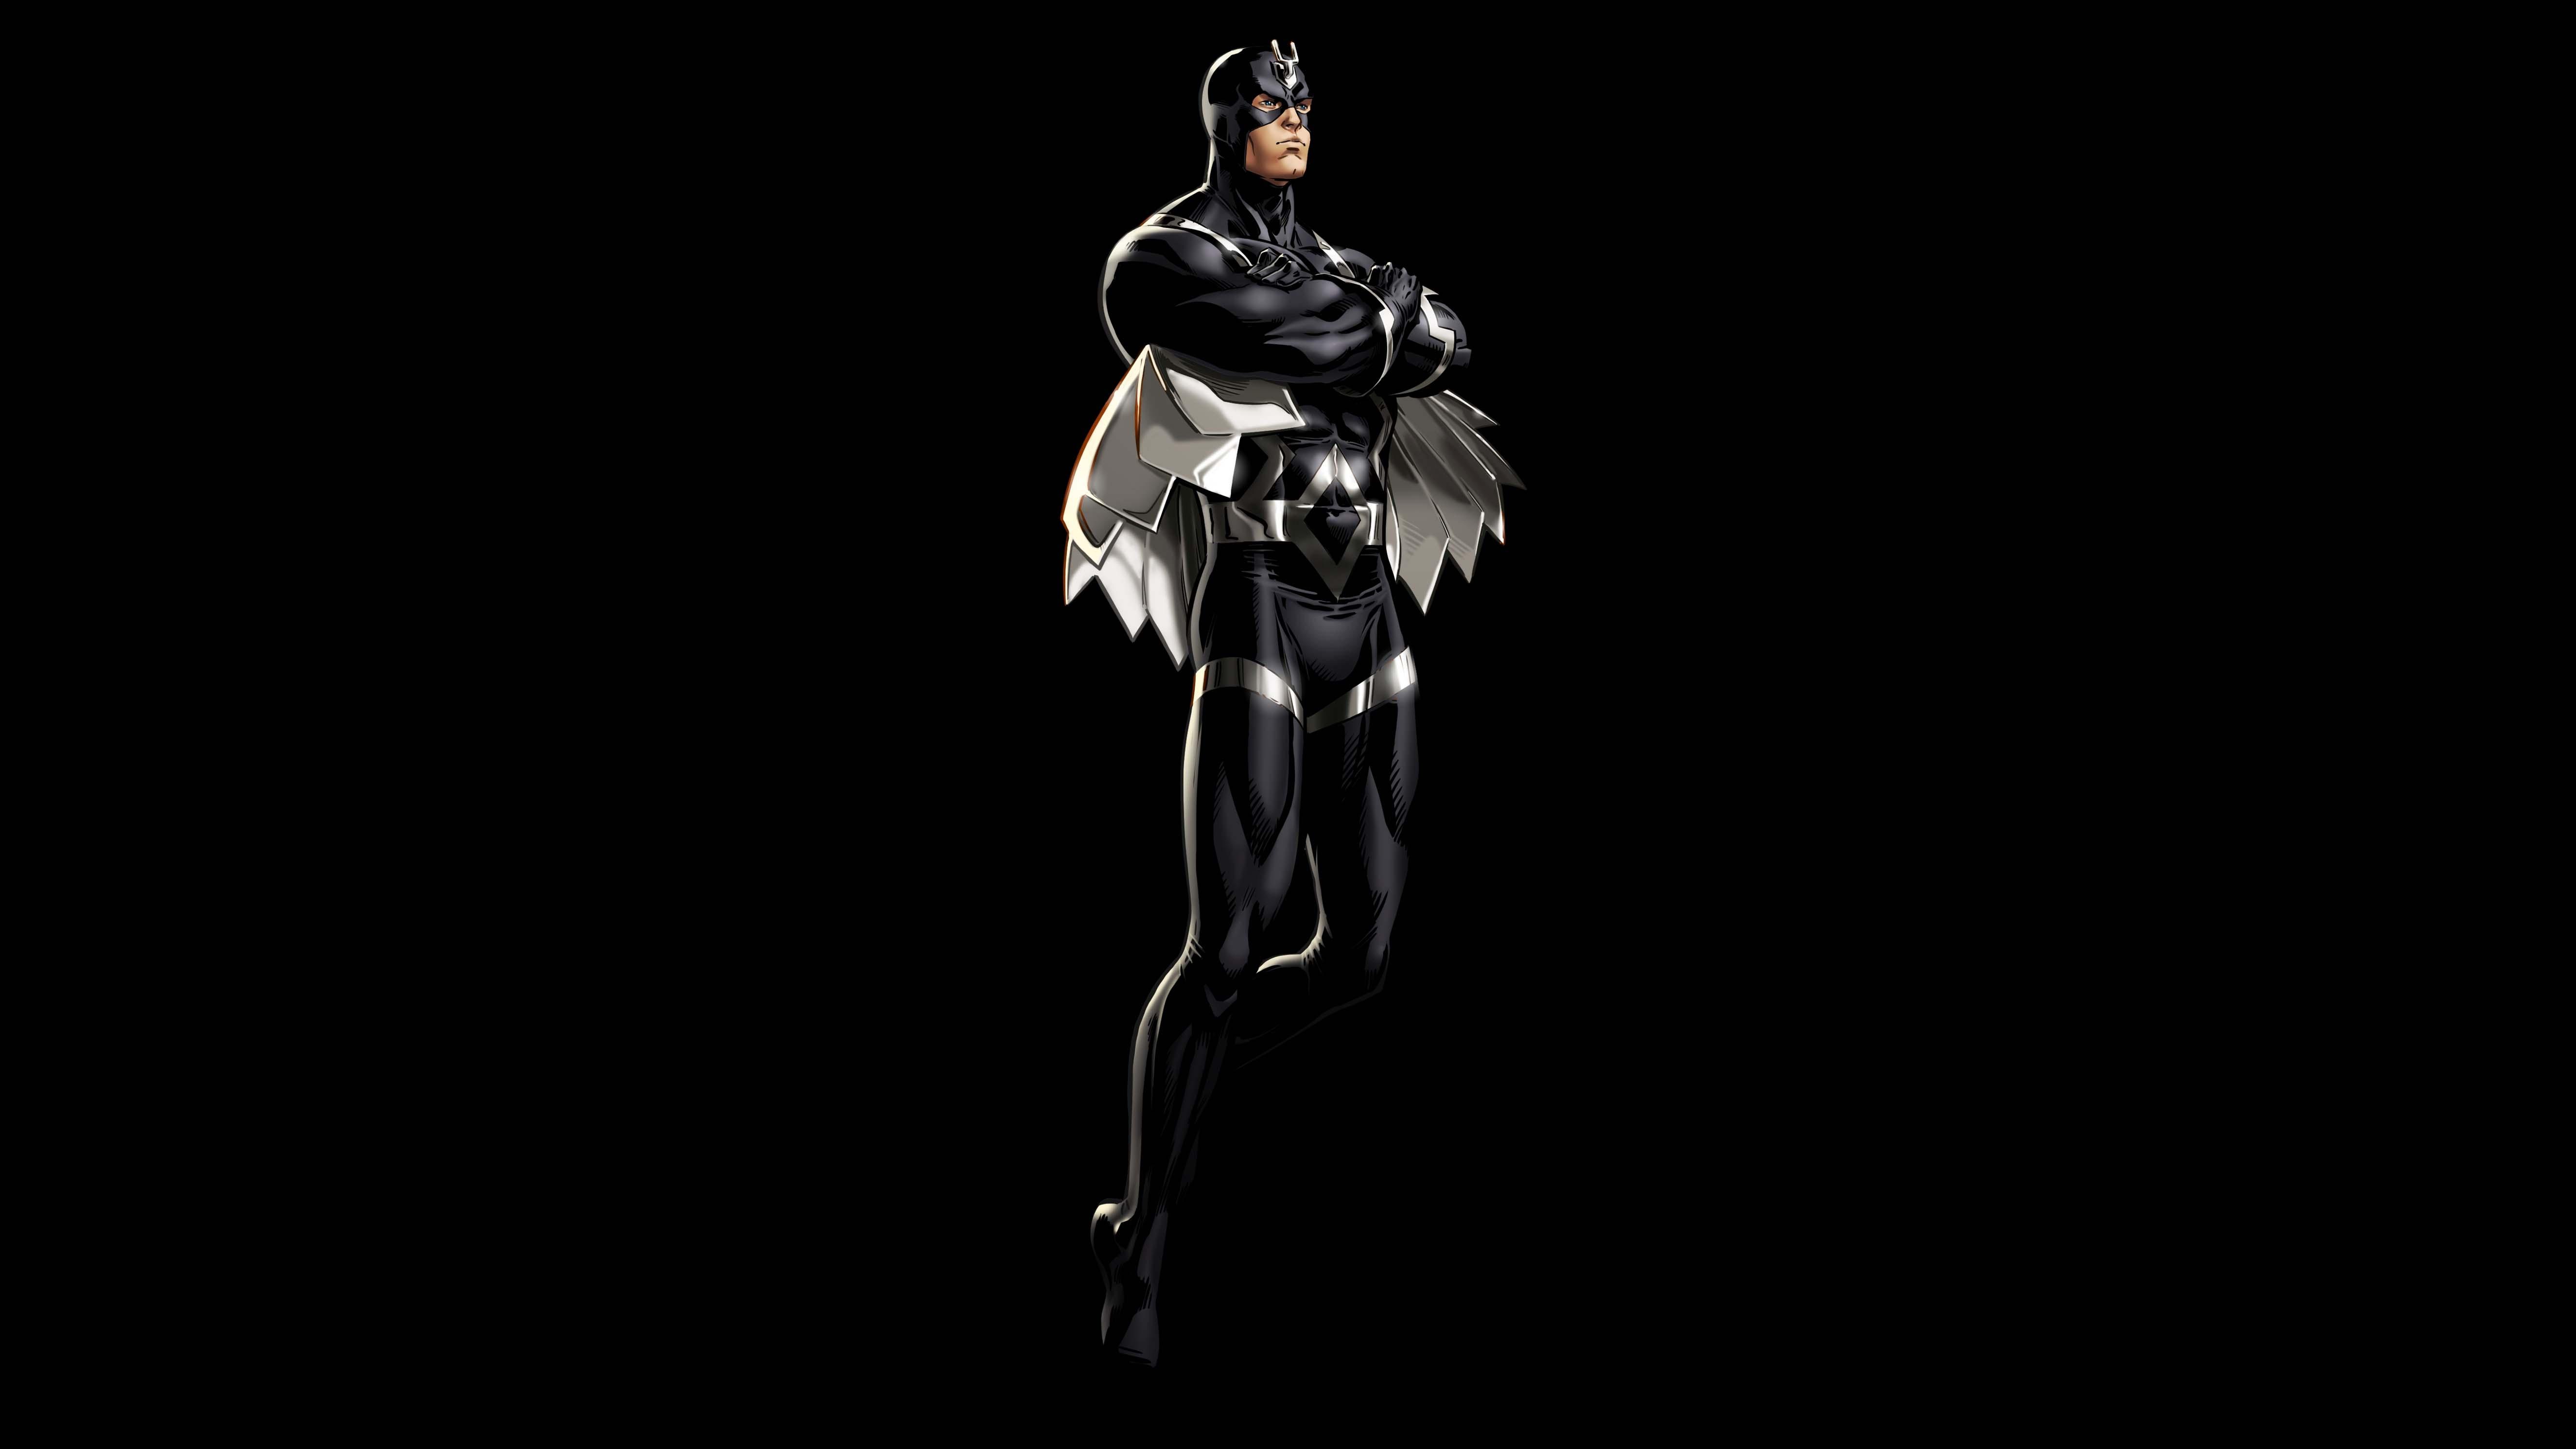 batman comic wallpaper iphone 6